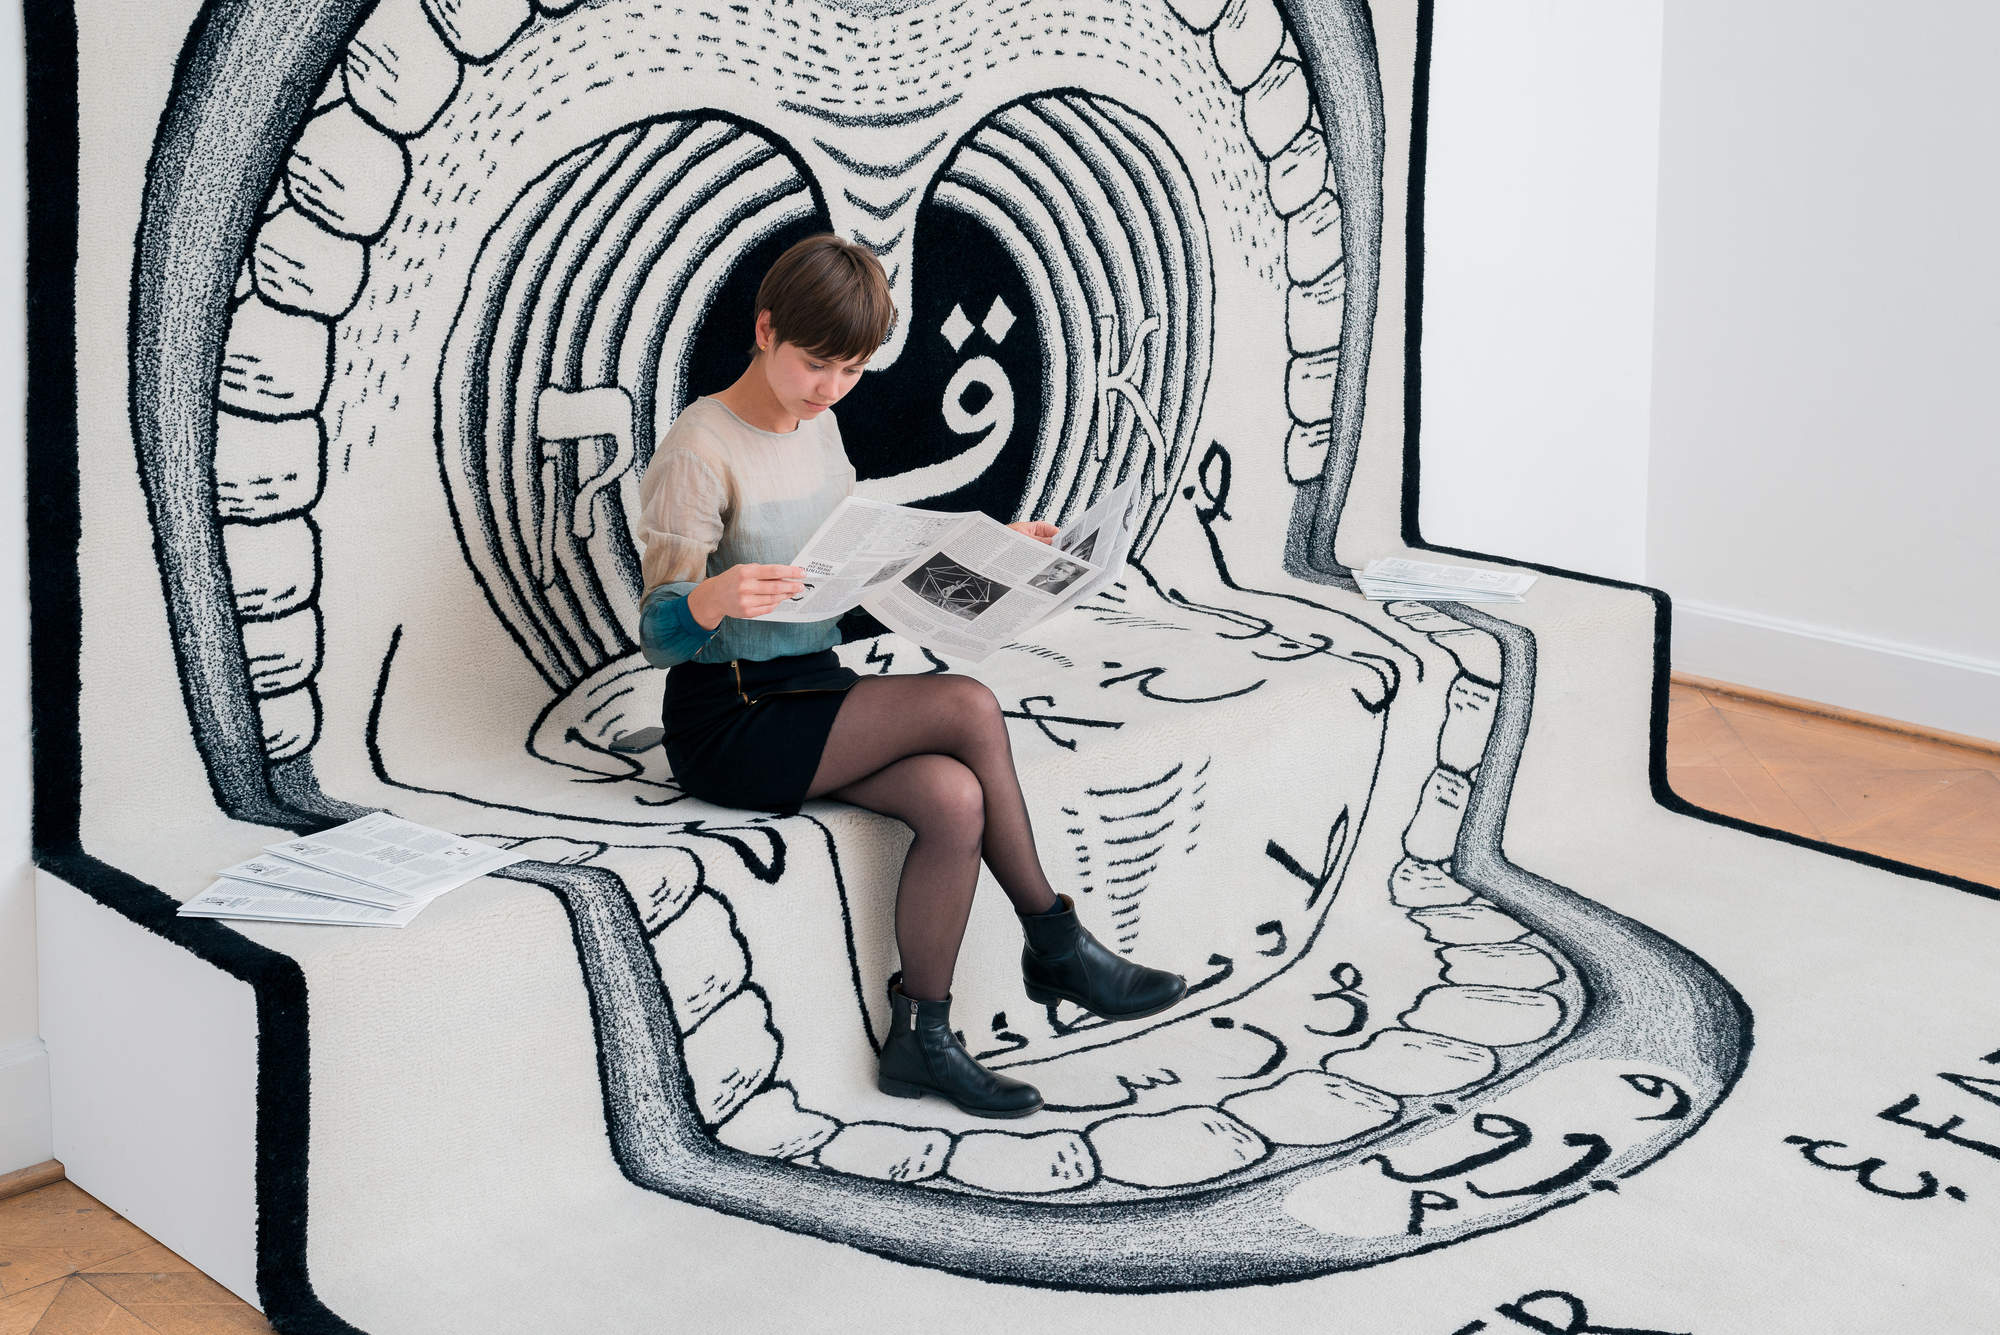 Open House at Kunstverein Braunschweig_Slavs and Tatars 2